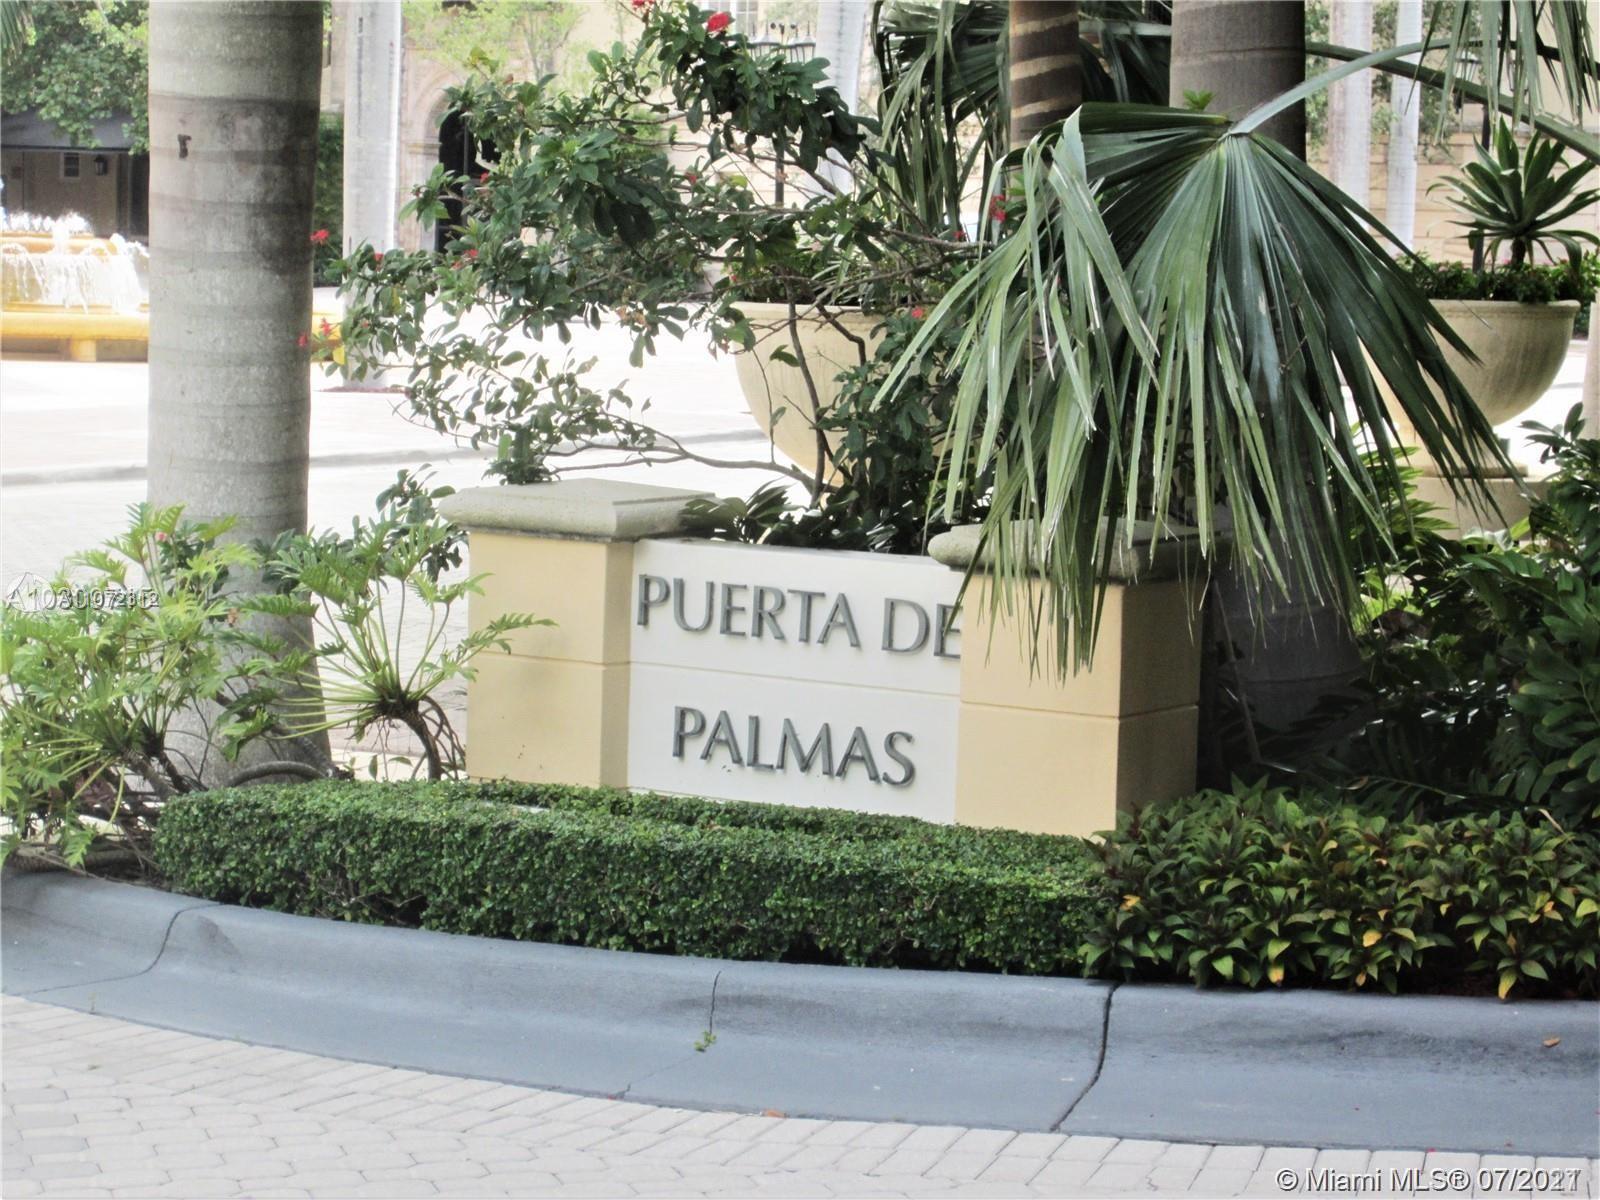 Puerta De Palmas #PH06 - 02 - photo